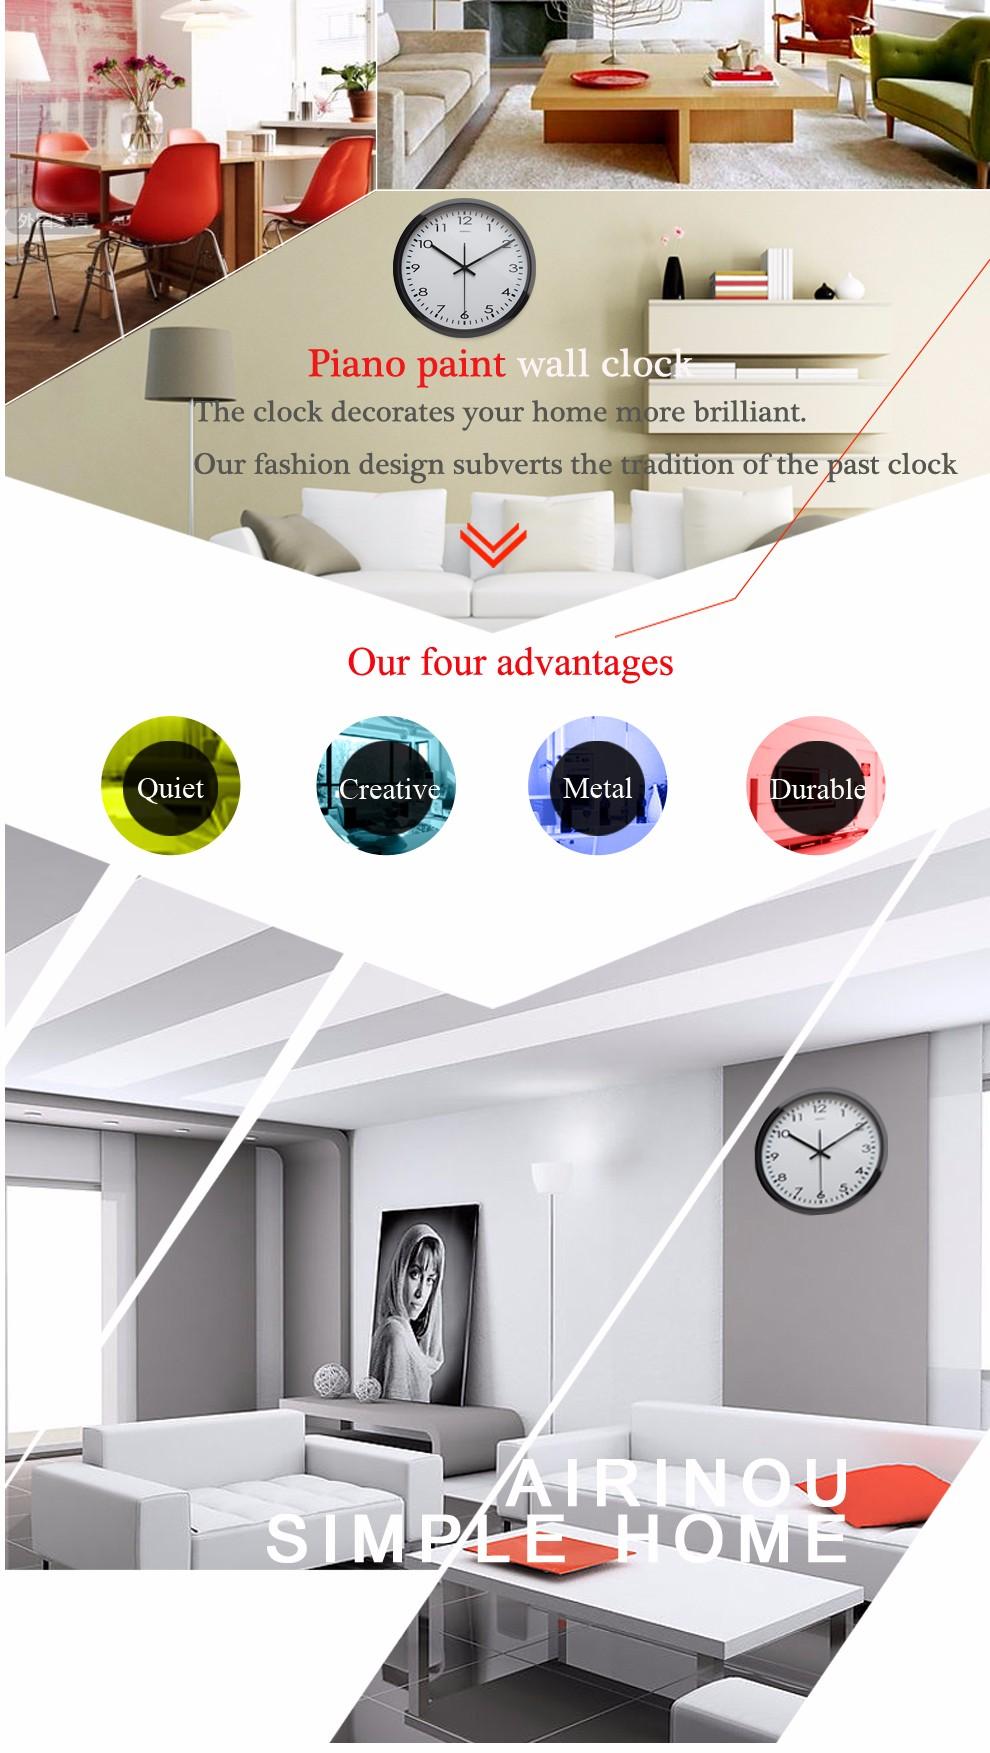 Airinou Corridor, living white simple modern office wall clock , High transparent glass silent movement clock